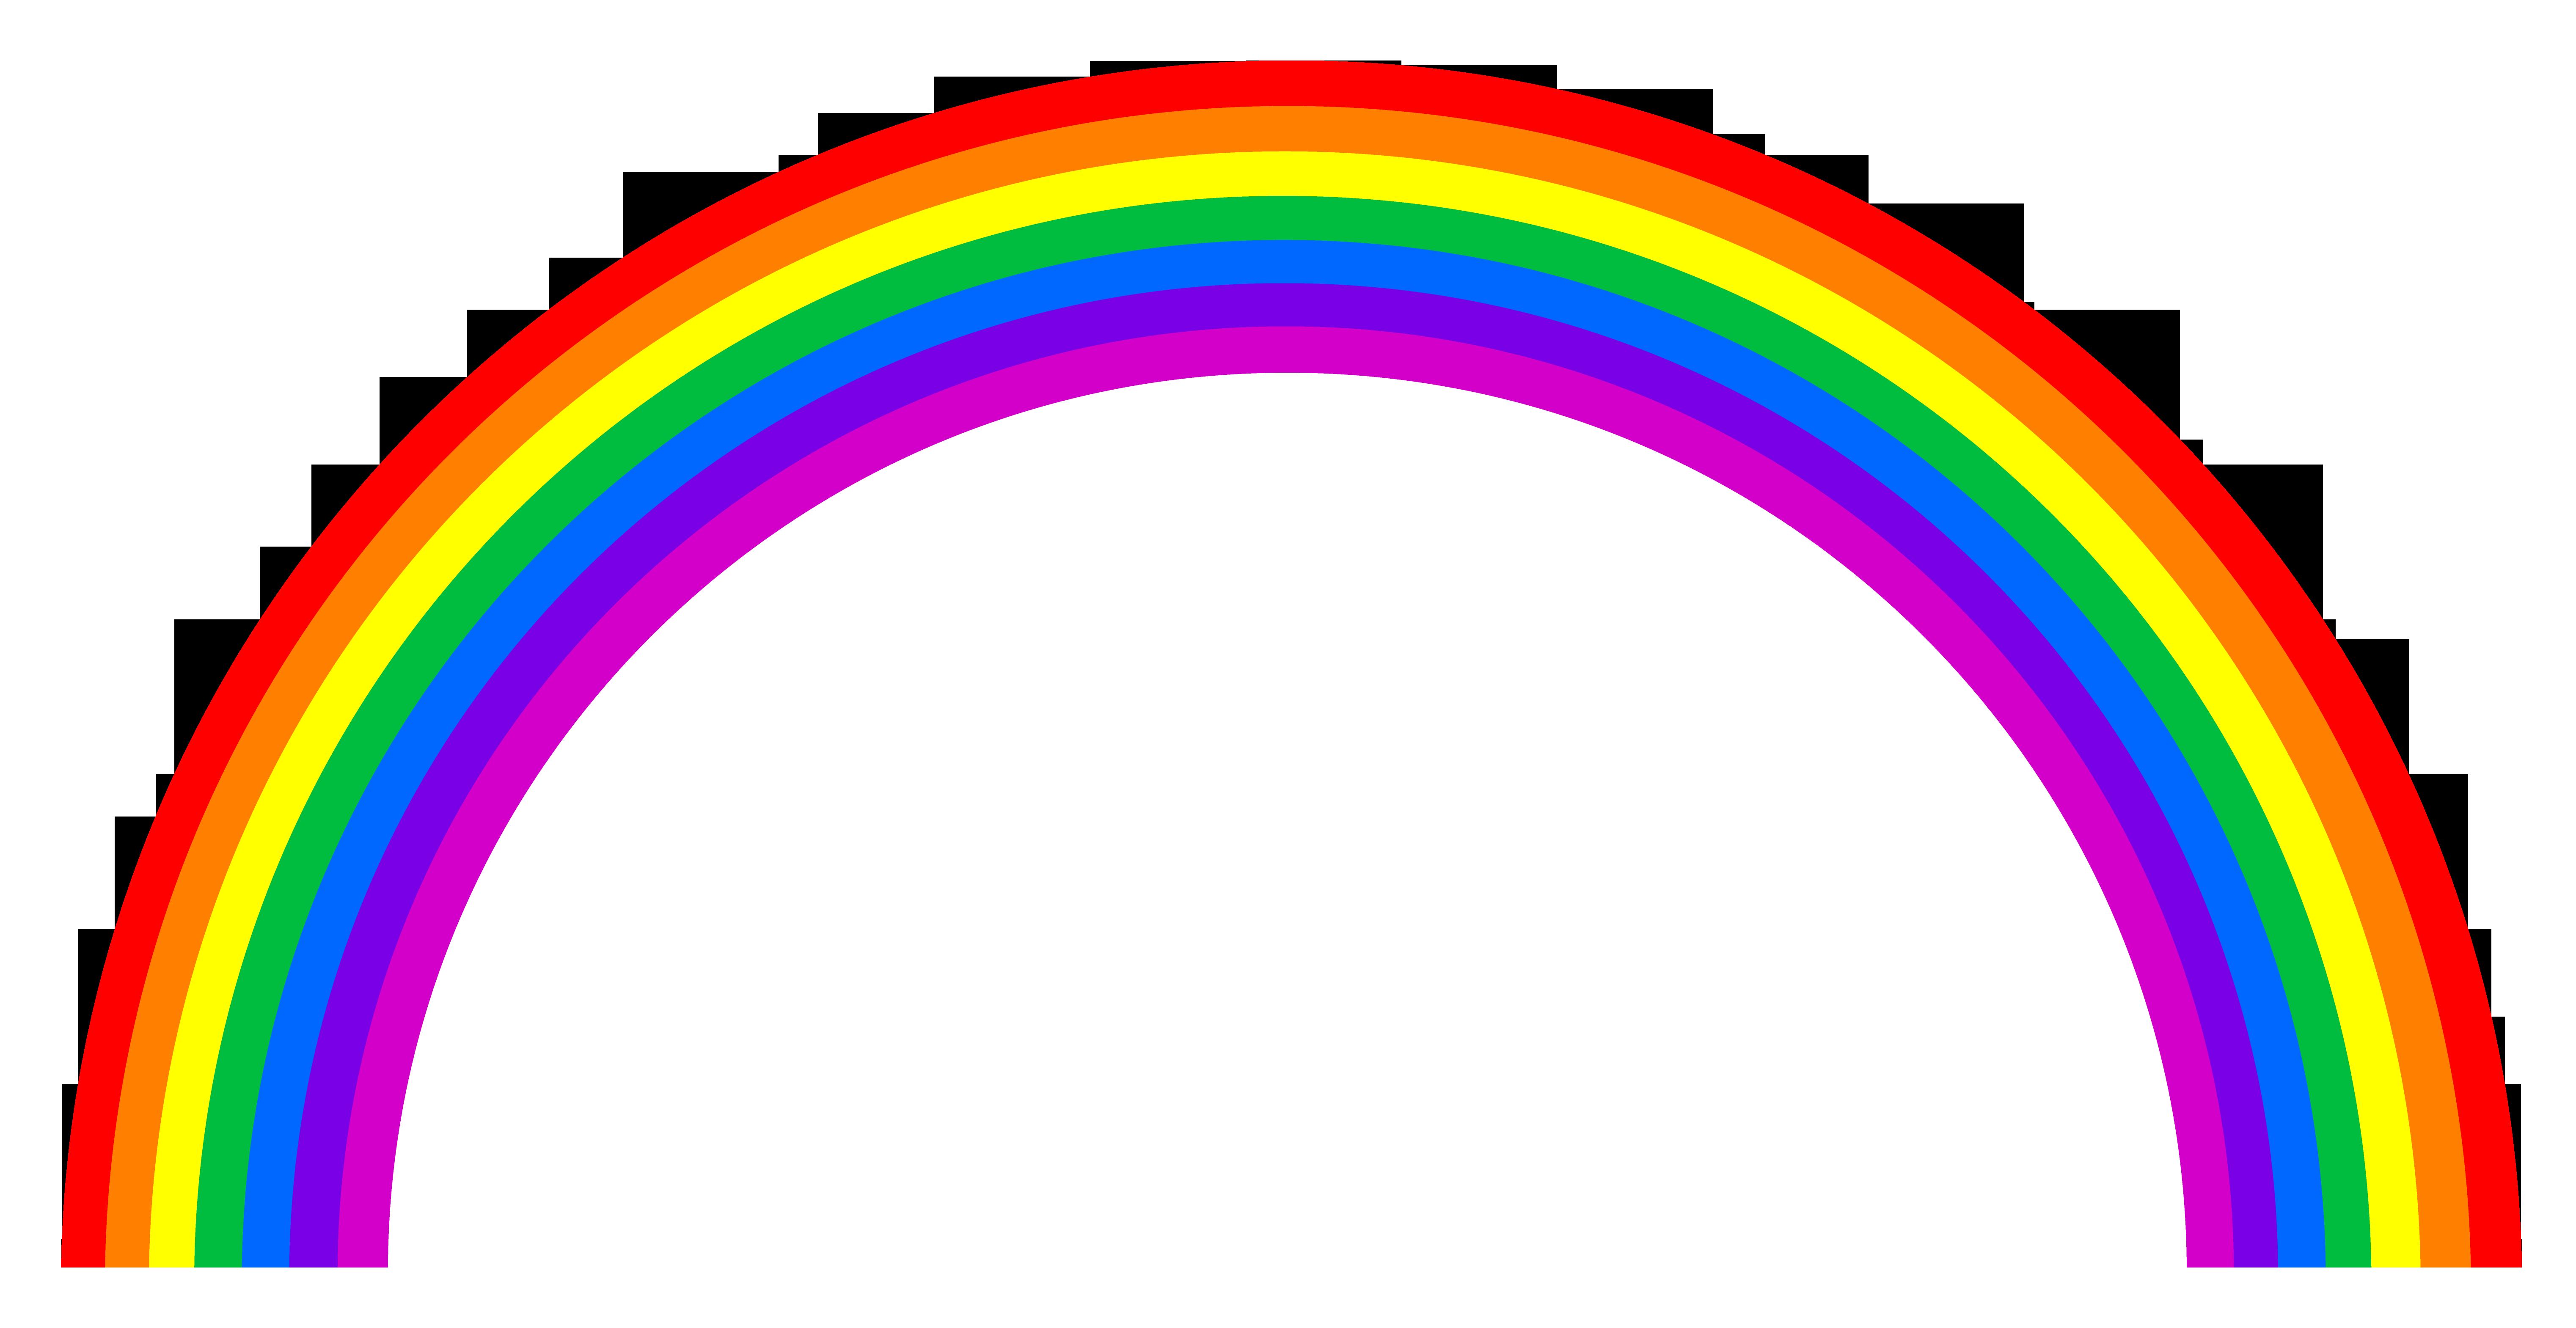 Rainbow Clipart Black And White Clipart Panda Free